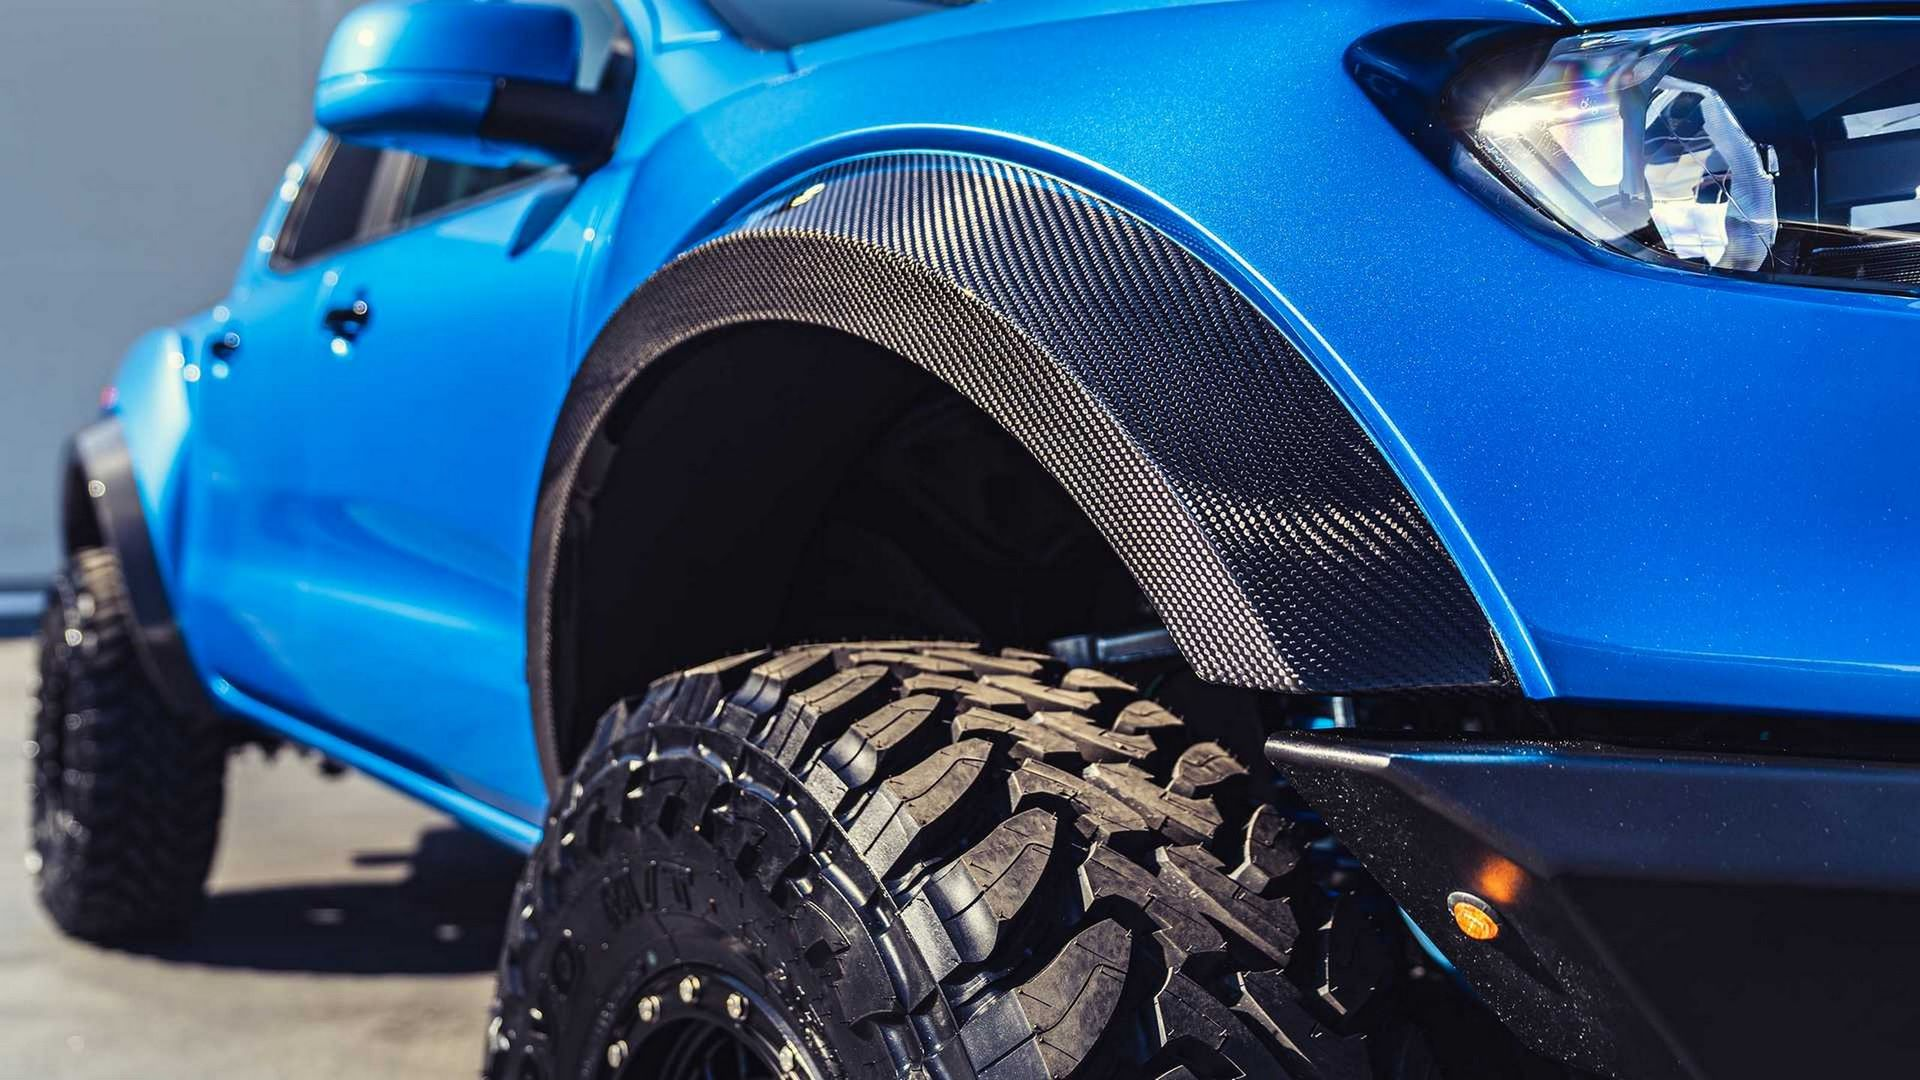 Ford-Ranger-Prorunner-By-APG-26